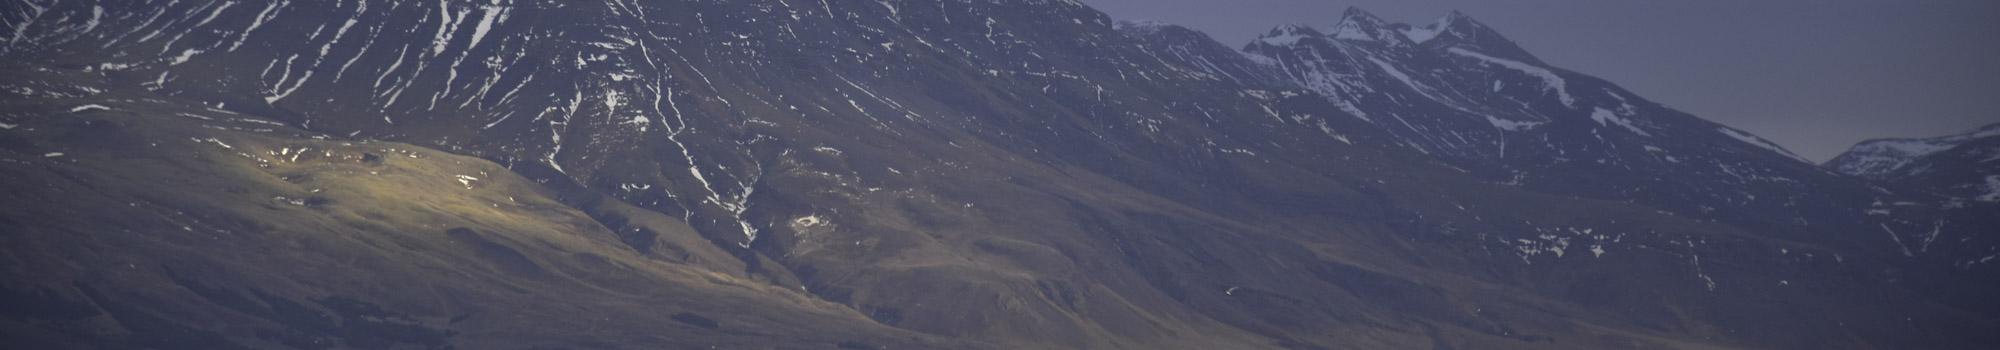 Mt Esja